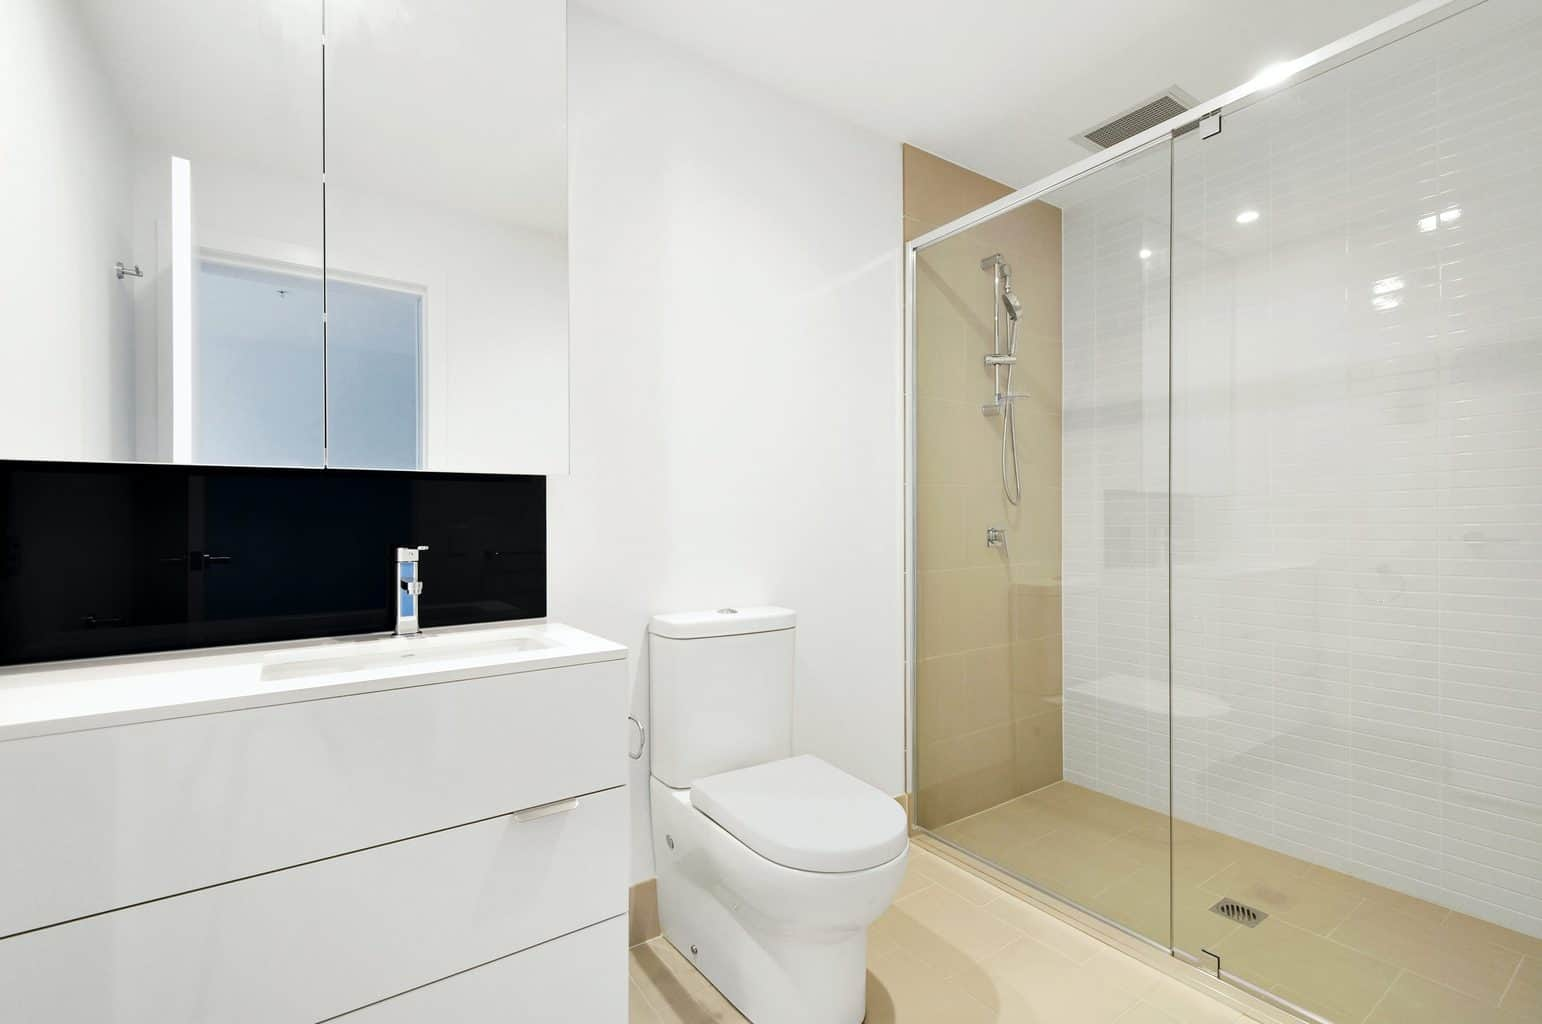 A bathroom with a glass shower door